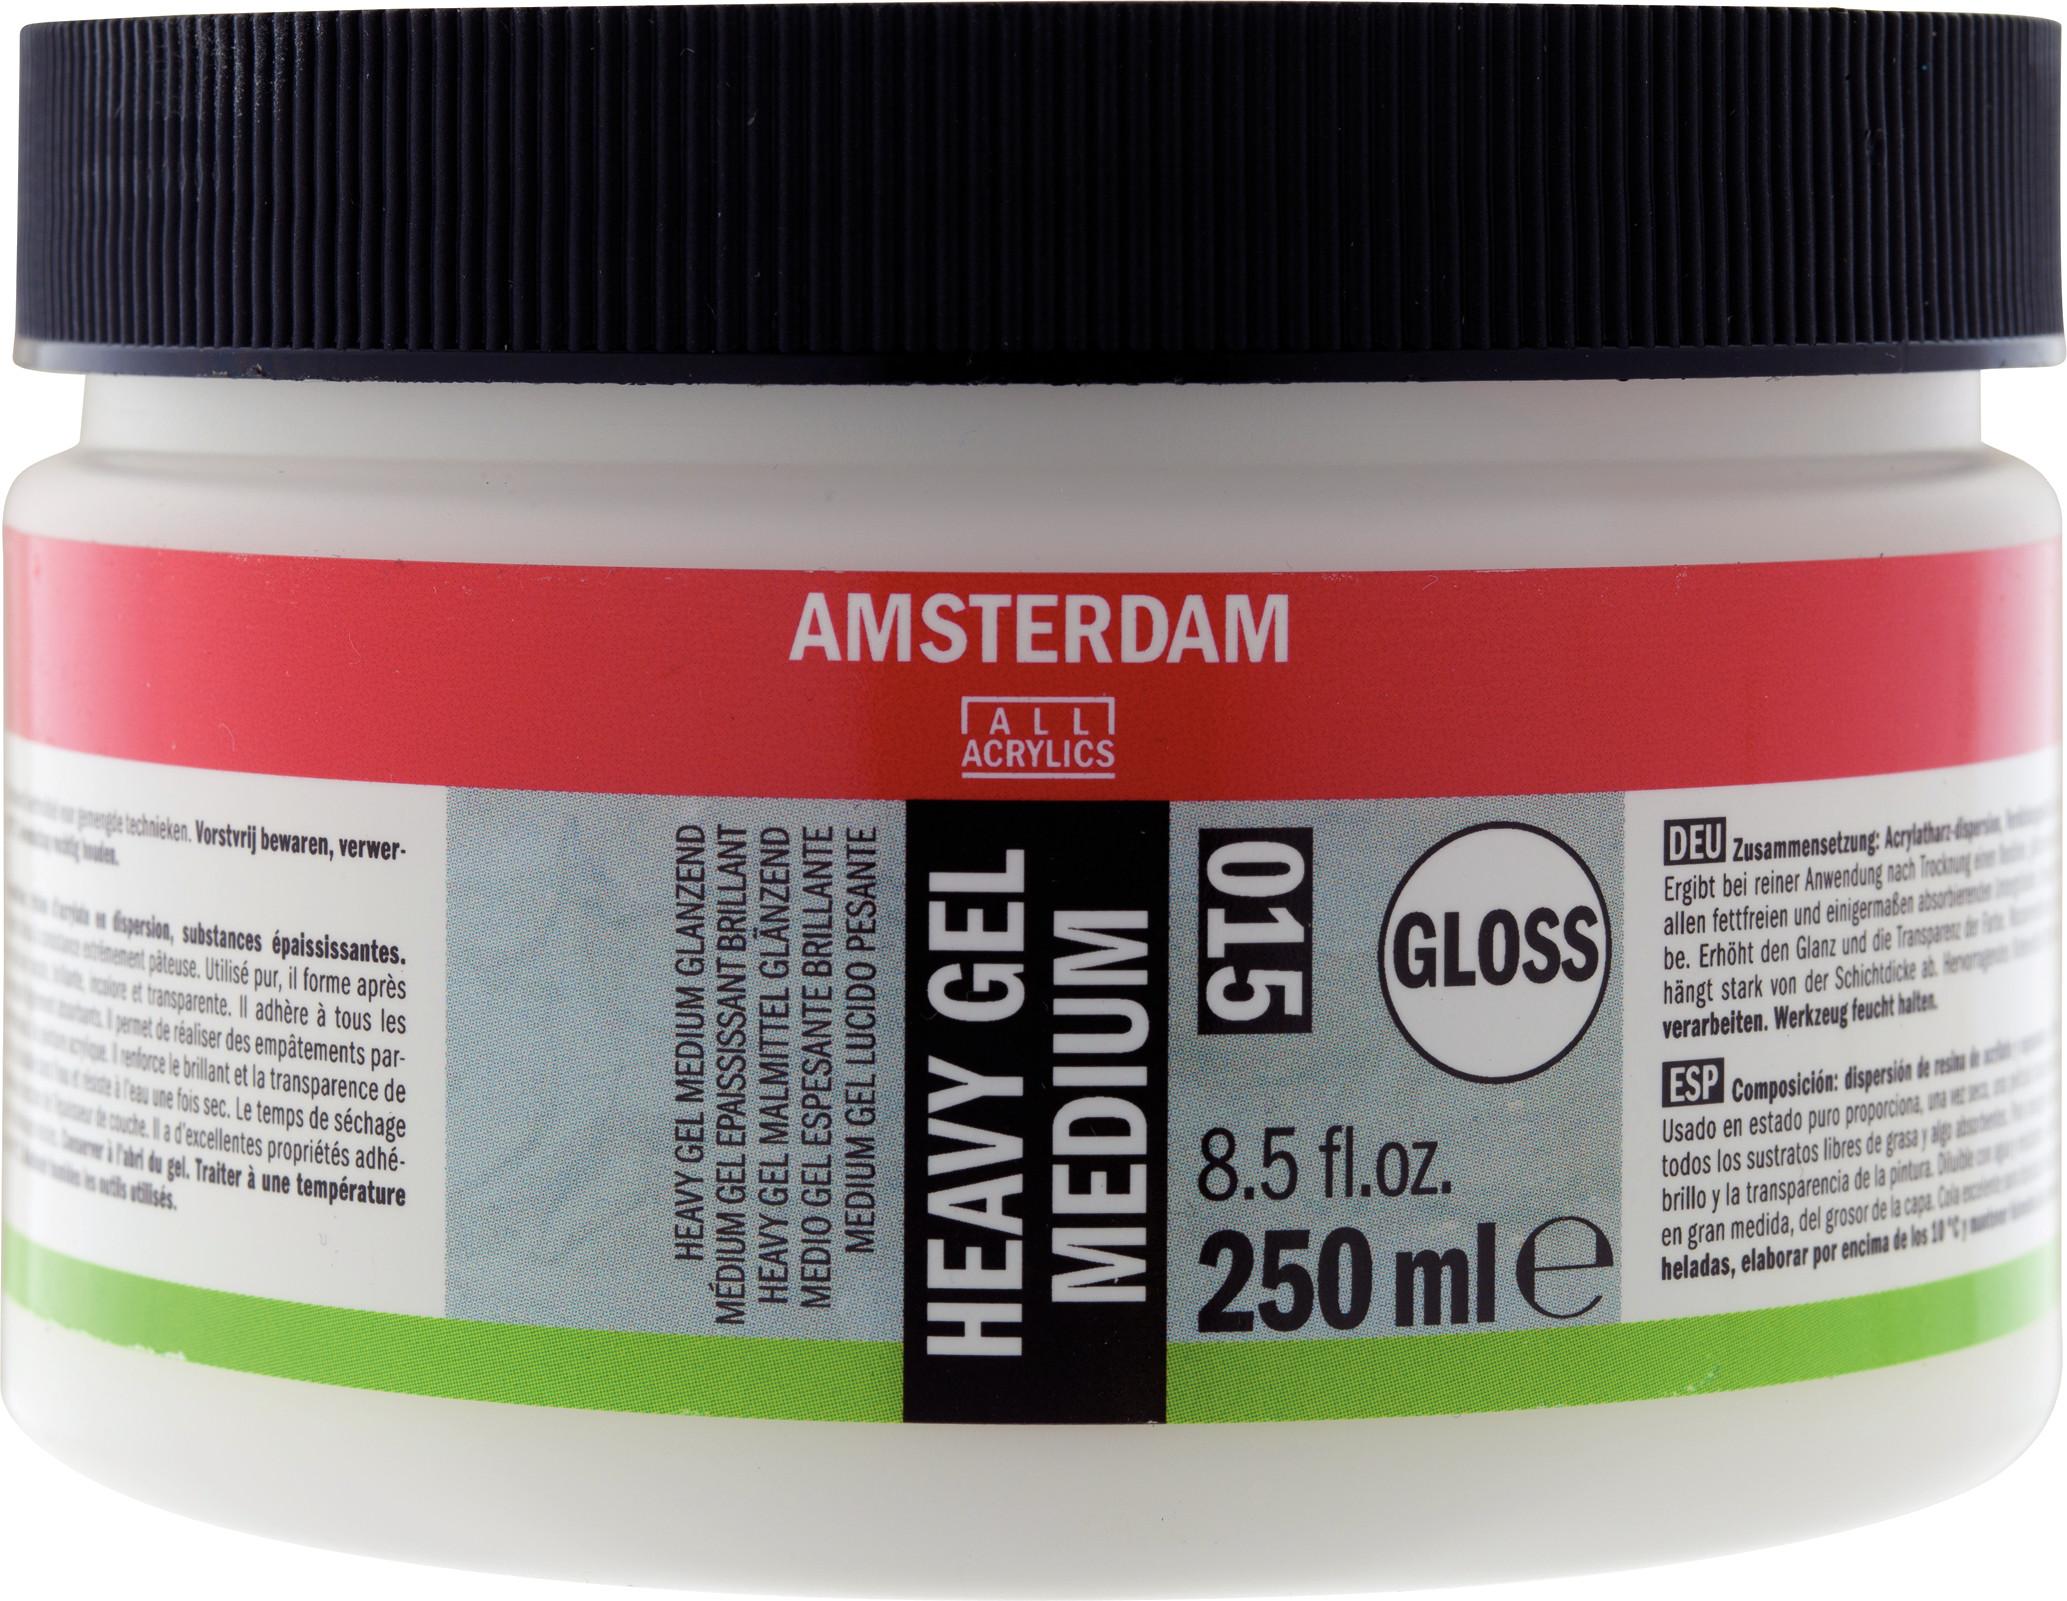 Amsterdam Heavy Gel Medium Gloss Jar 250 ml